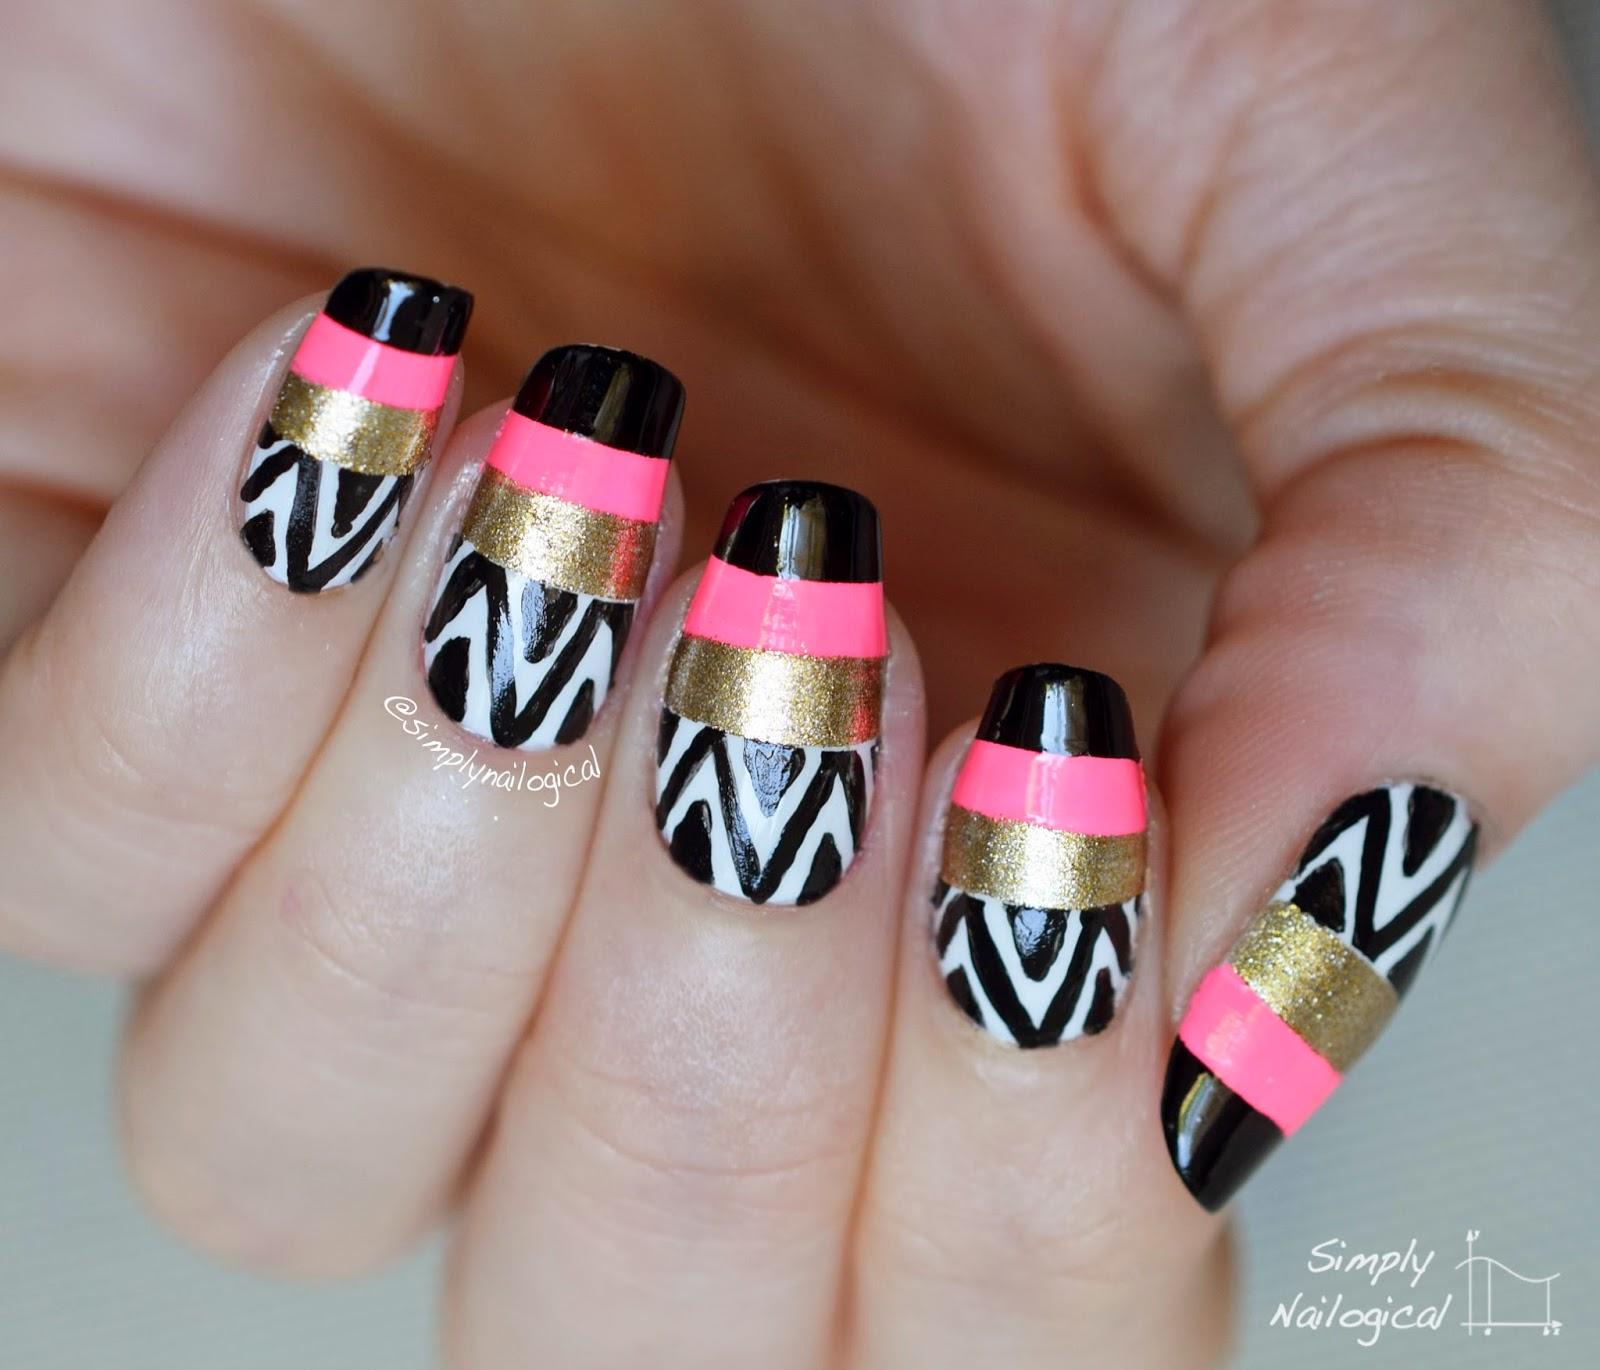 Simply Nailogical Nail Art: : Mani Swap: A Night In